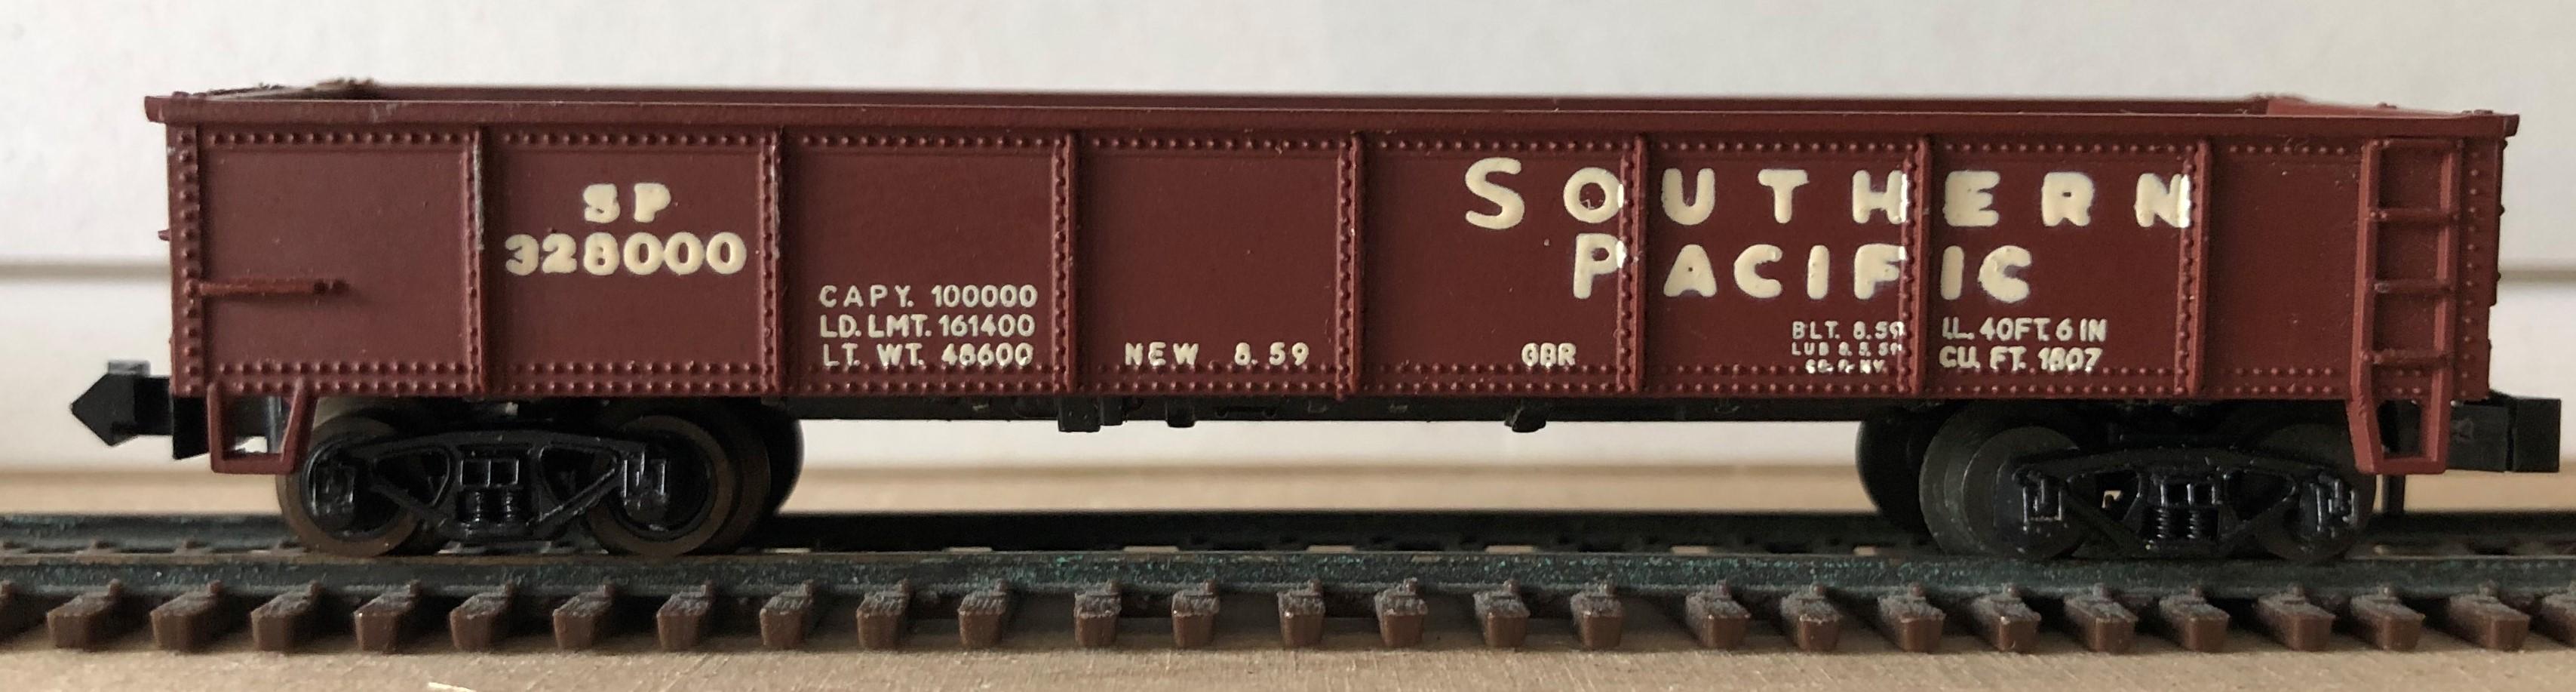 N Scale - Minitrix - 3210 - Gondola, 40 Foot, Steel - Southern Pacific - 328000